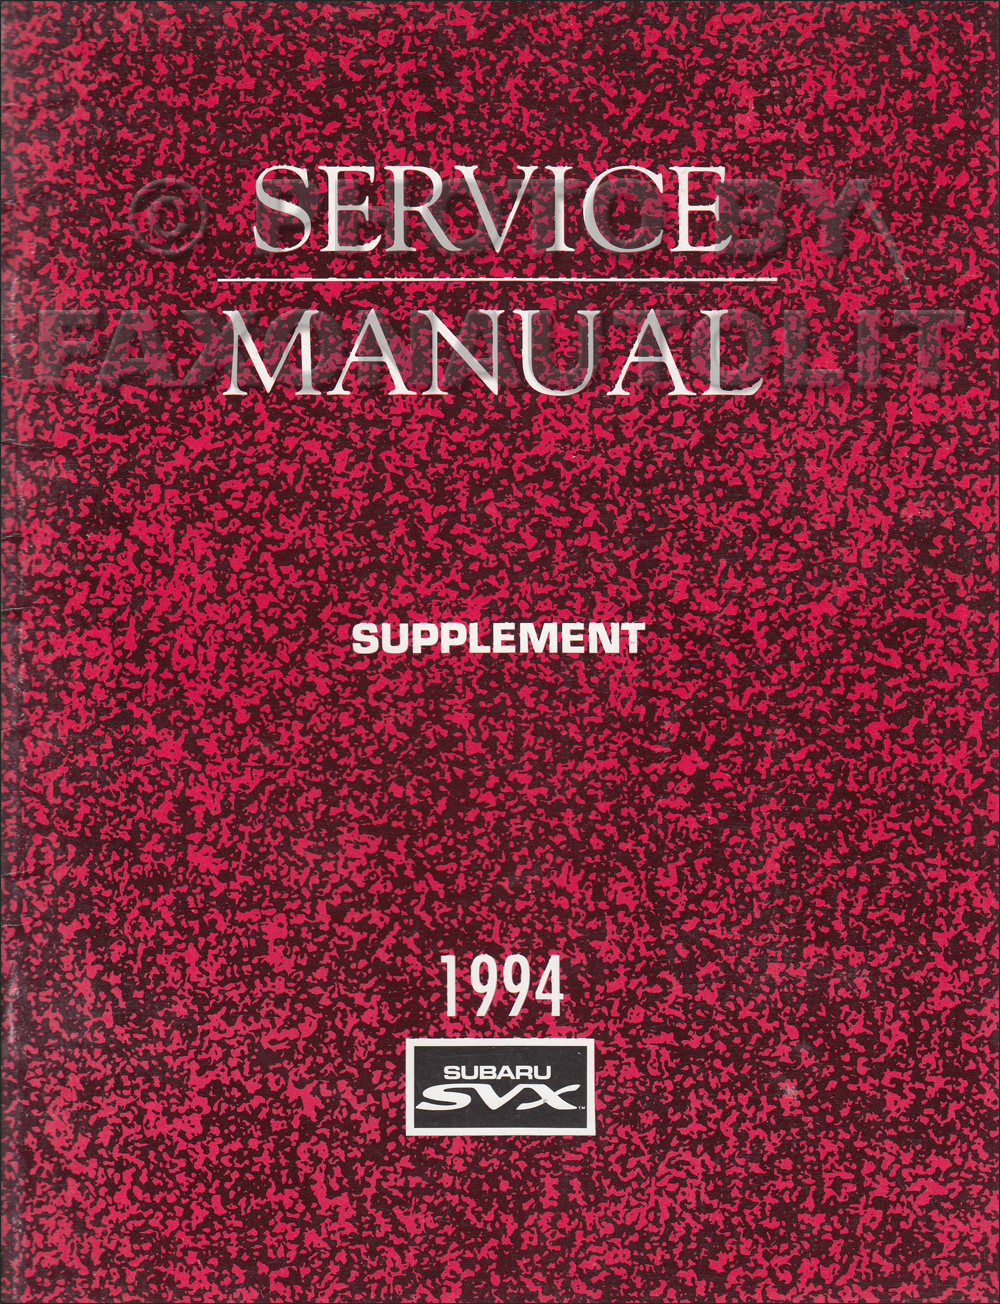 1994 Subaru Svx Wiring Diagram Trusted Schematics Stereo Repair Shop Manual Supplement Original Axles New